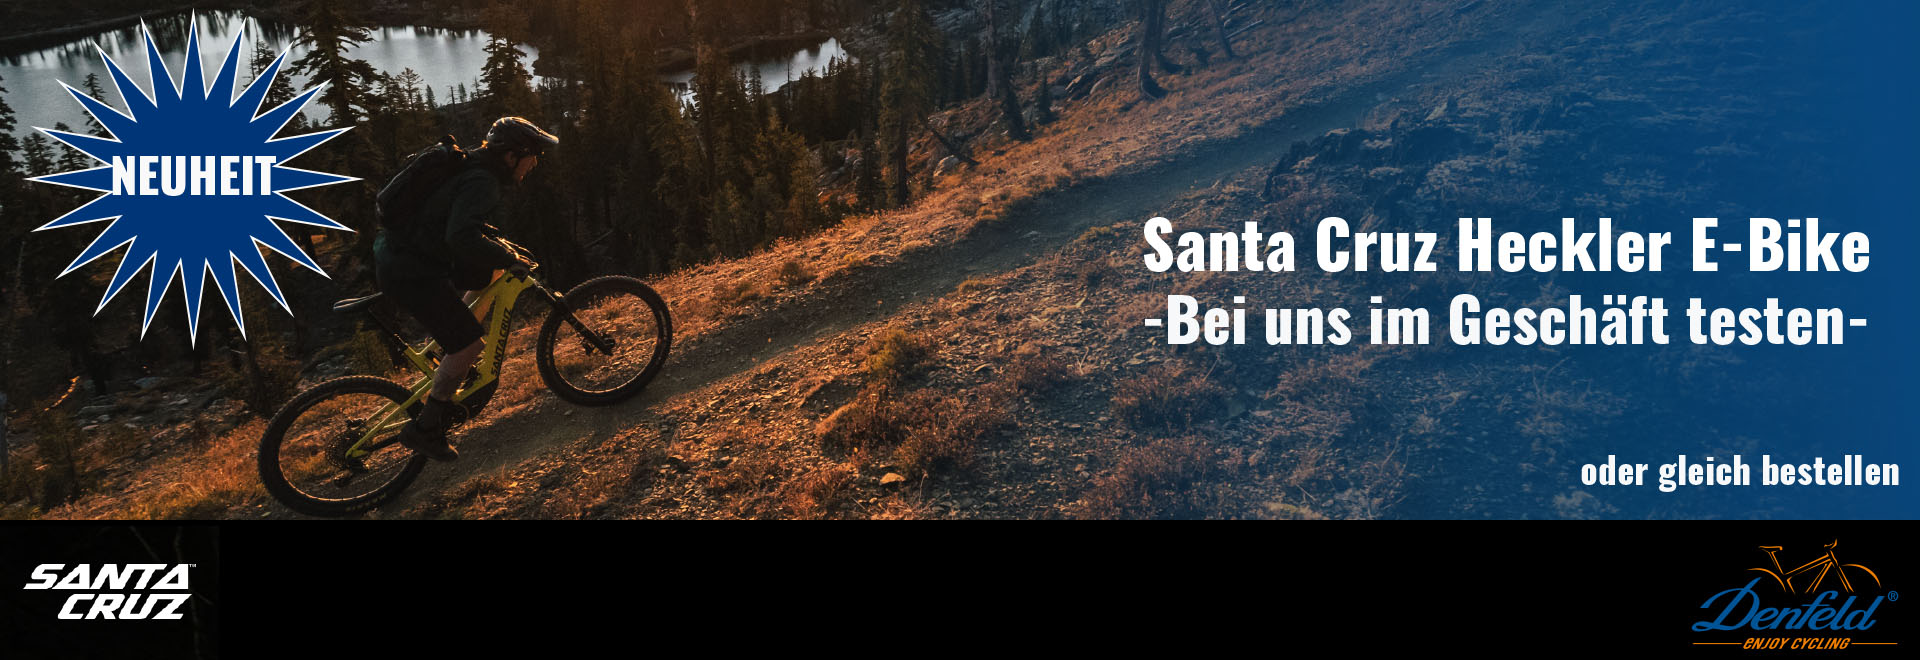 Santa Cruz Heckler